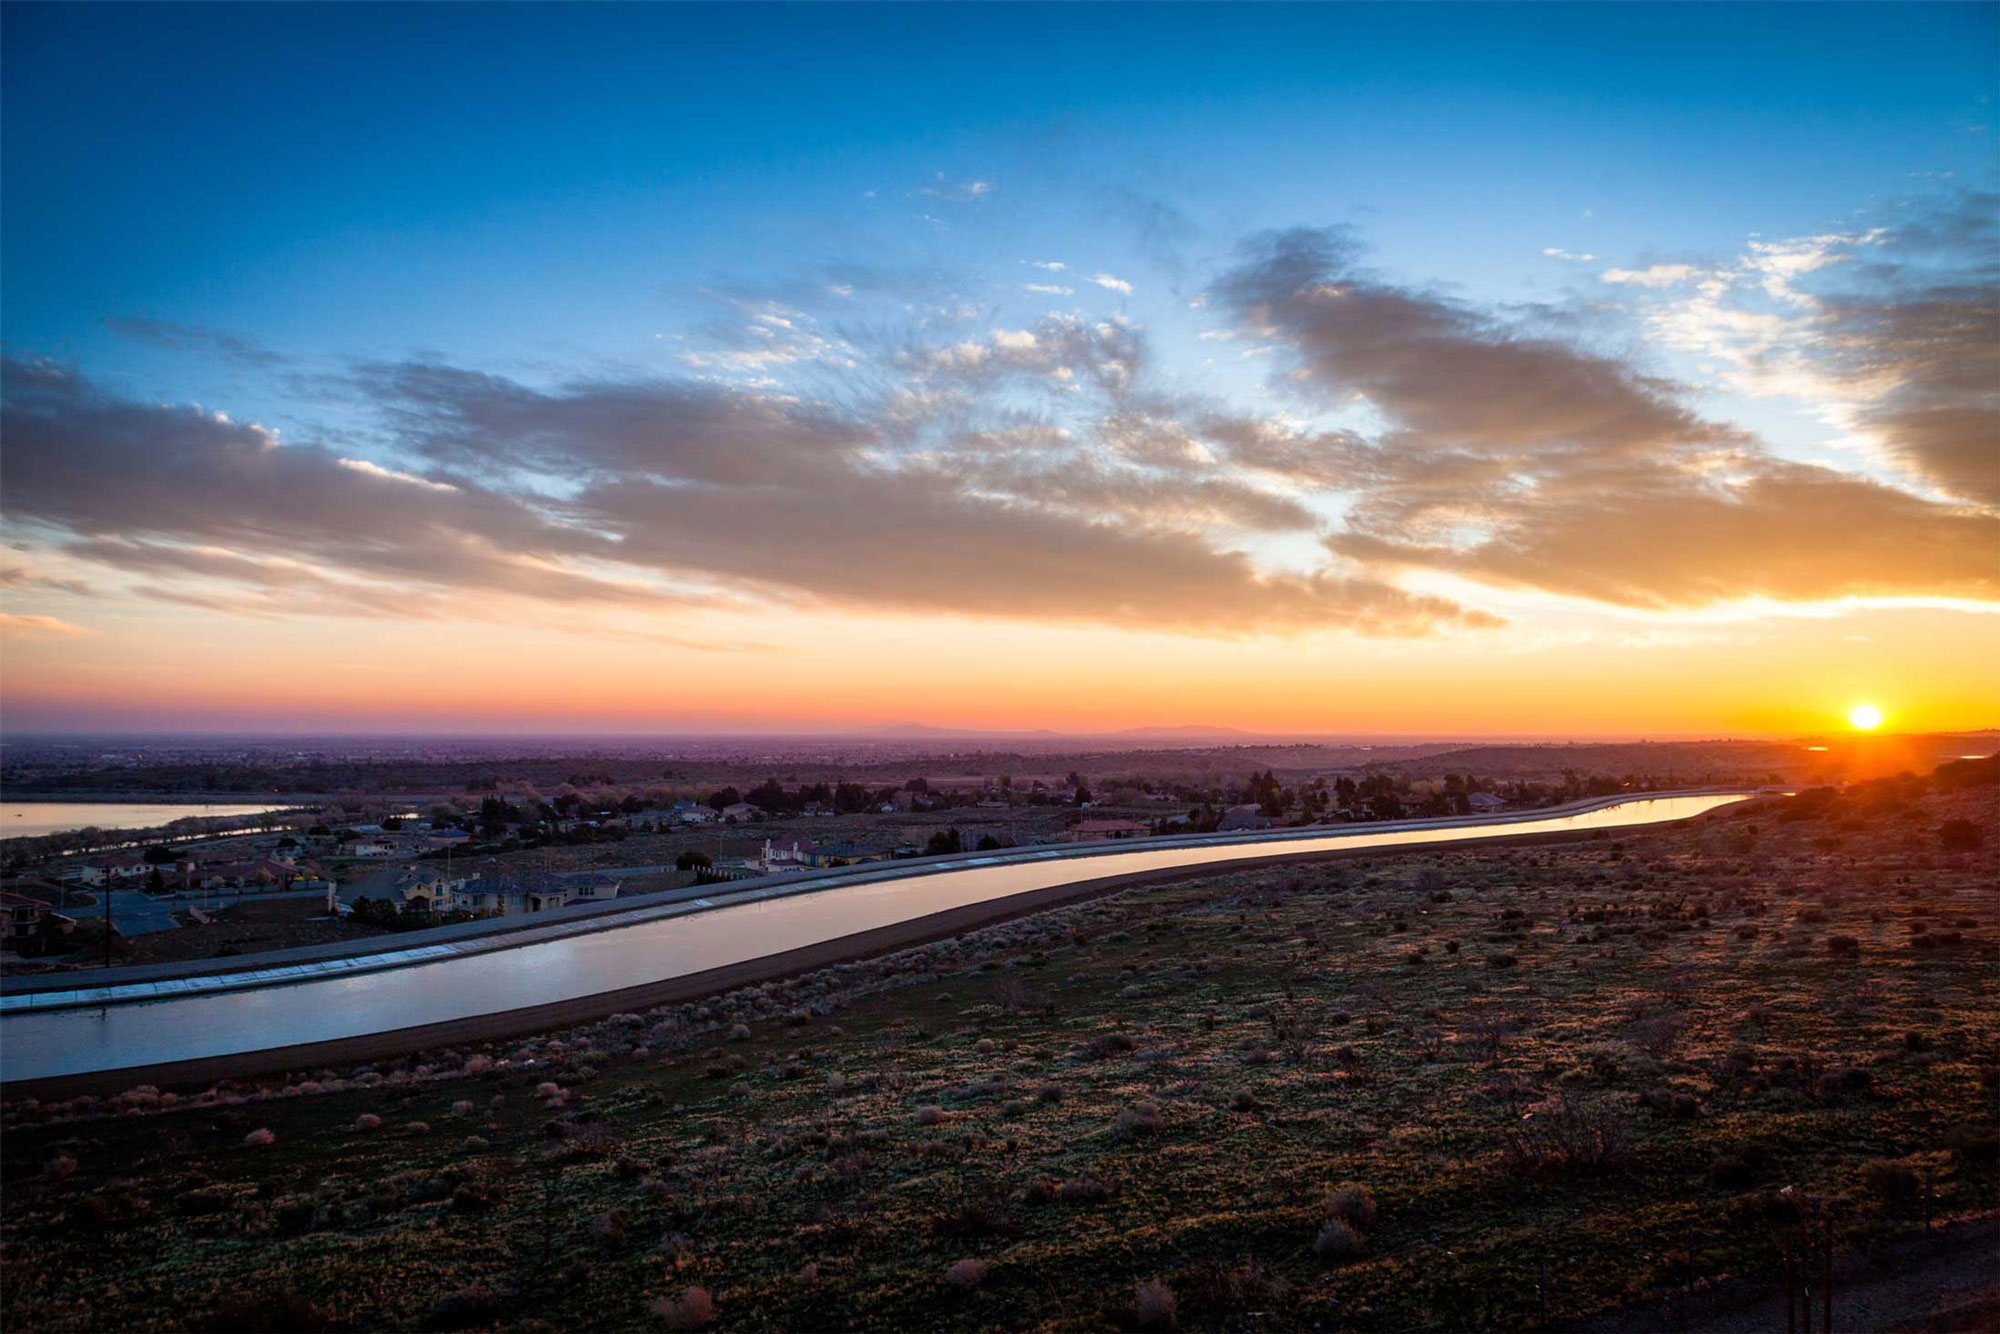 image - Sunrise over California